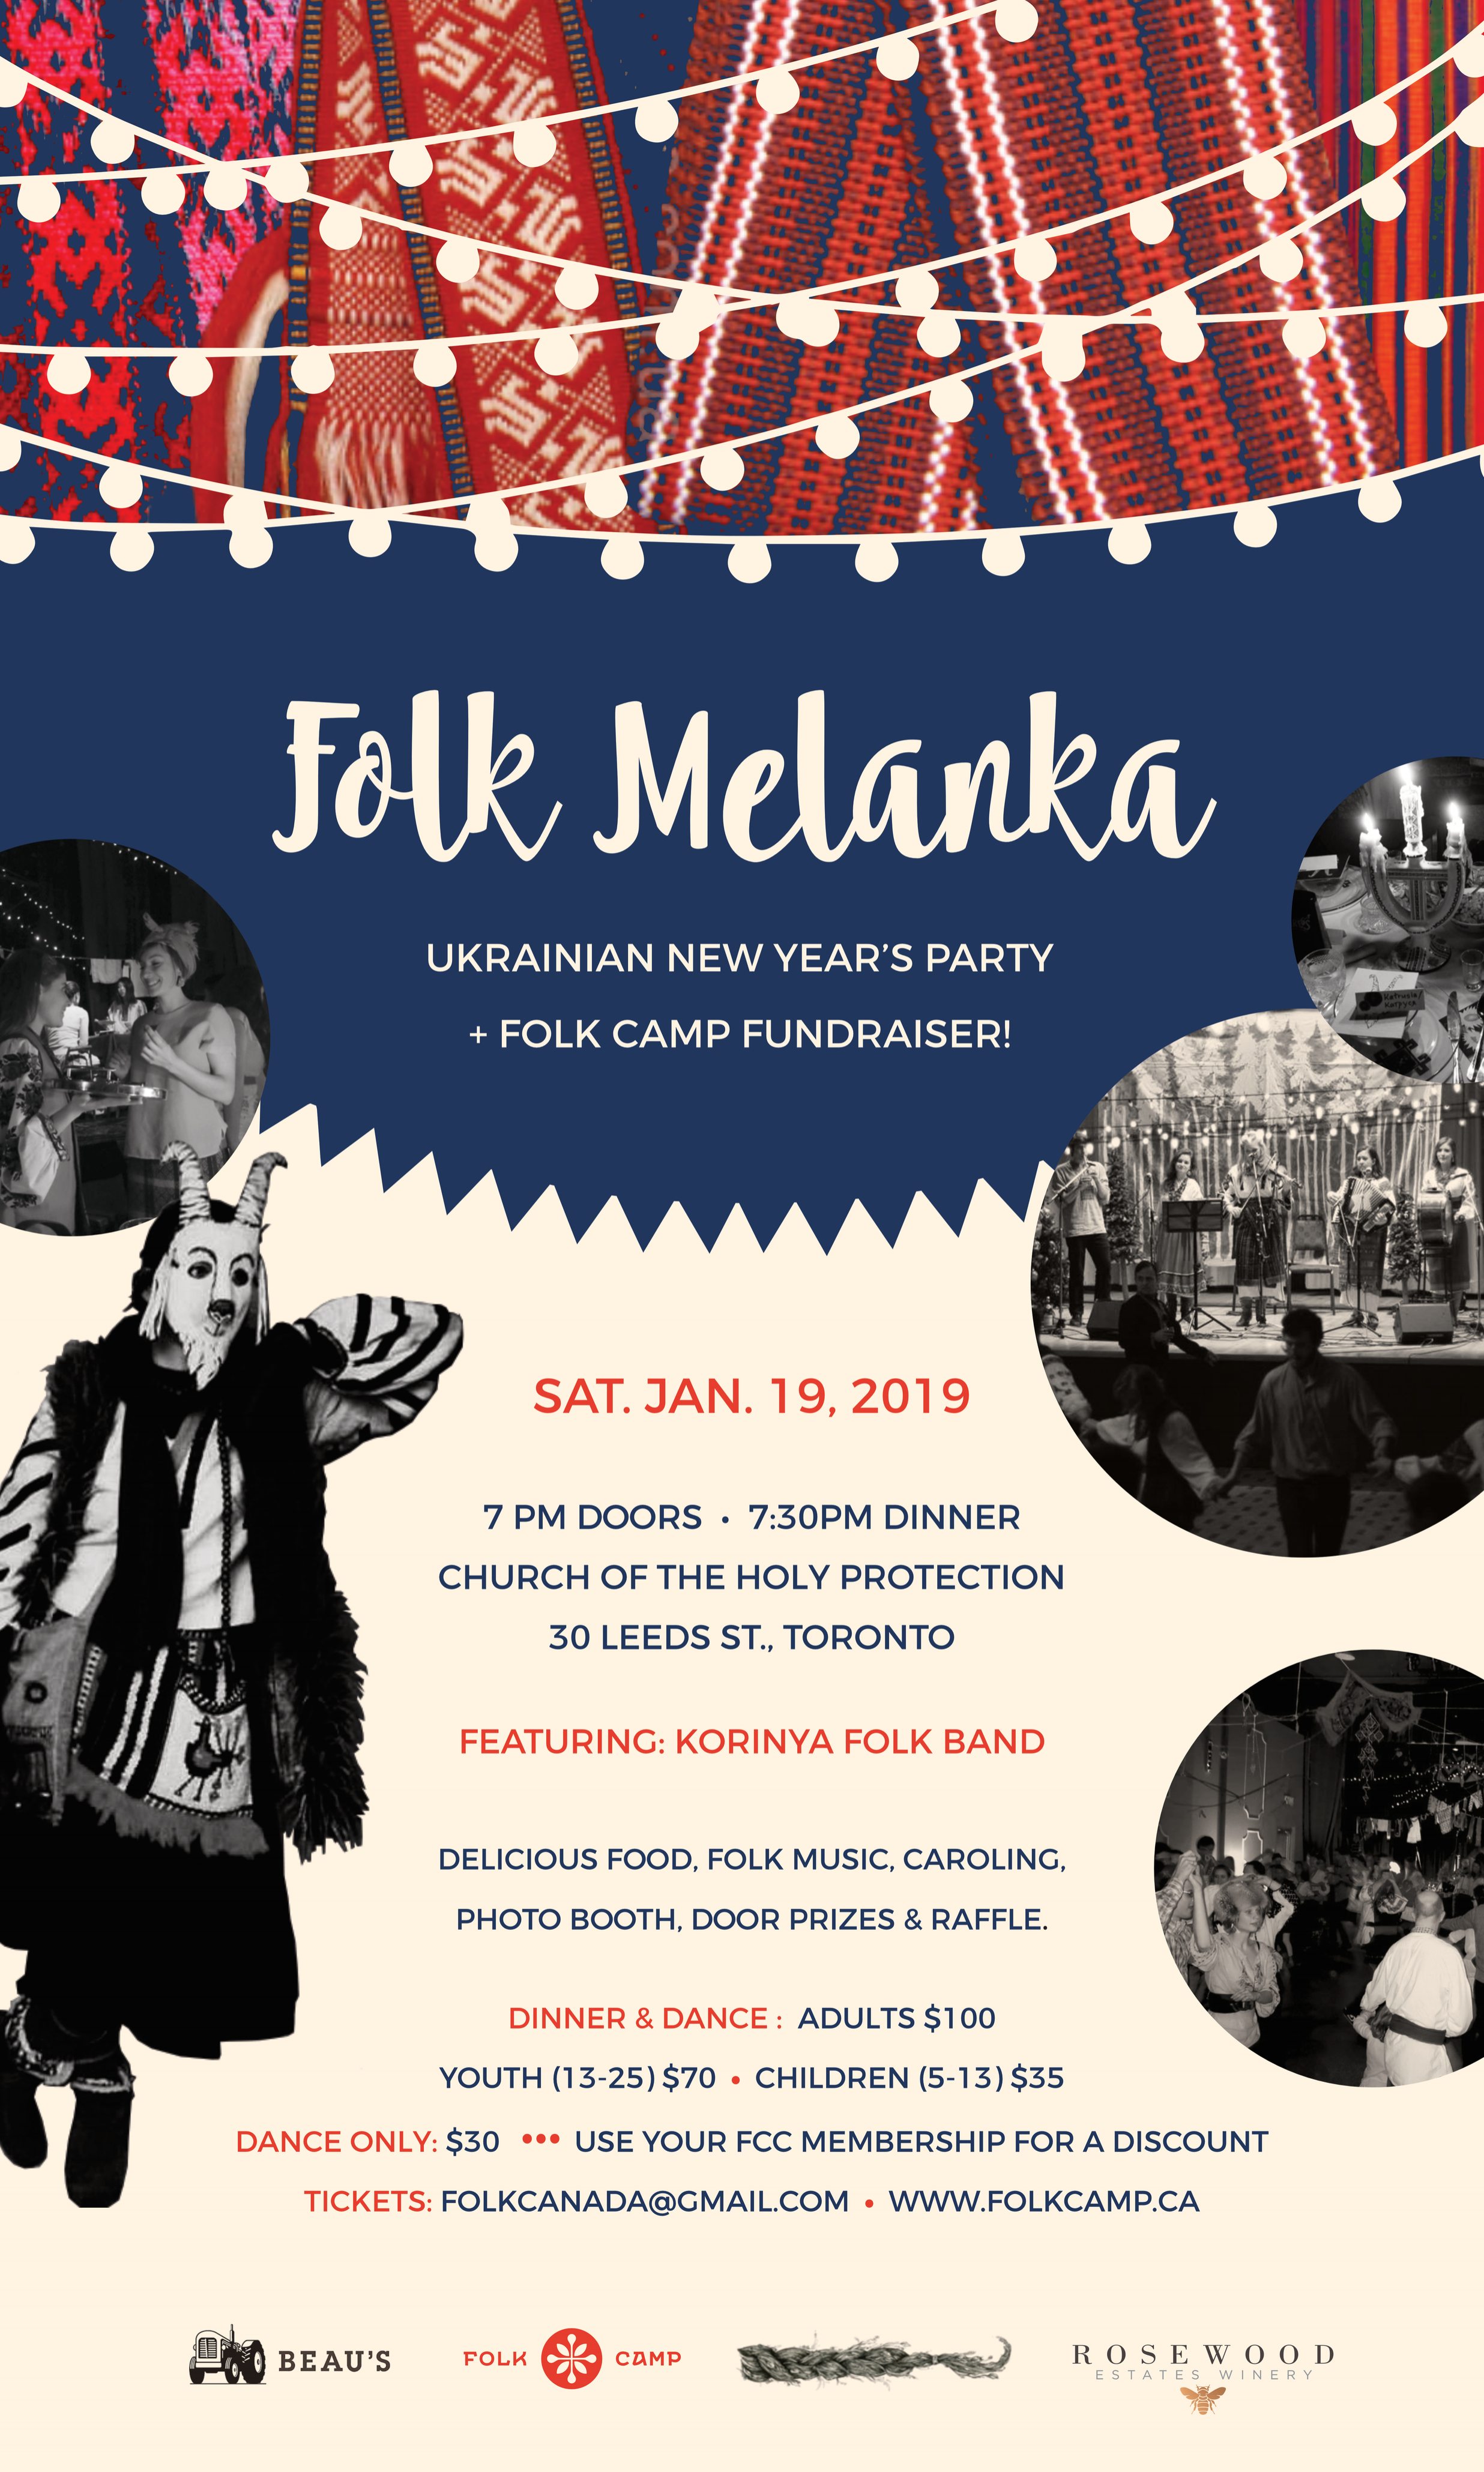 FOLKCAMP_MELANKA_2019_WEB.png